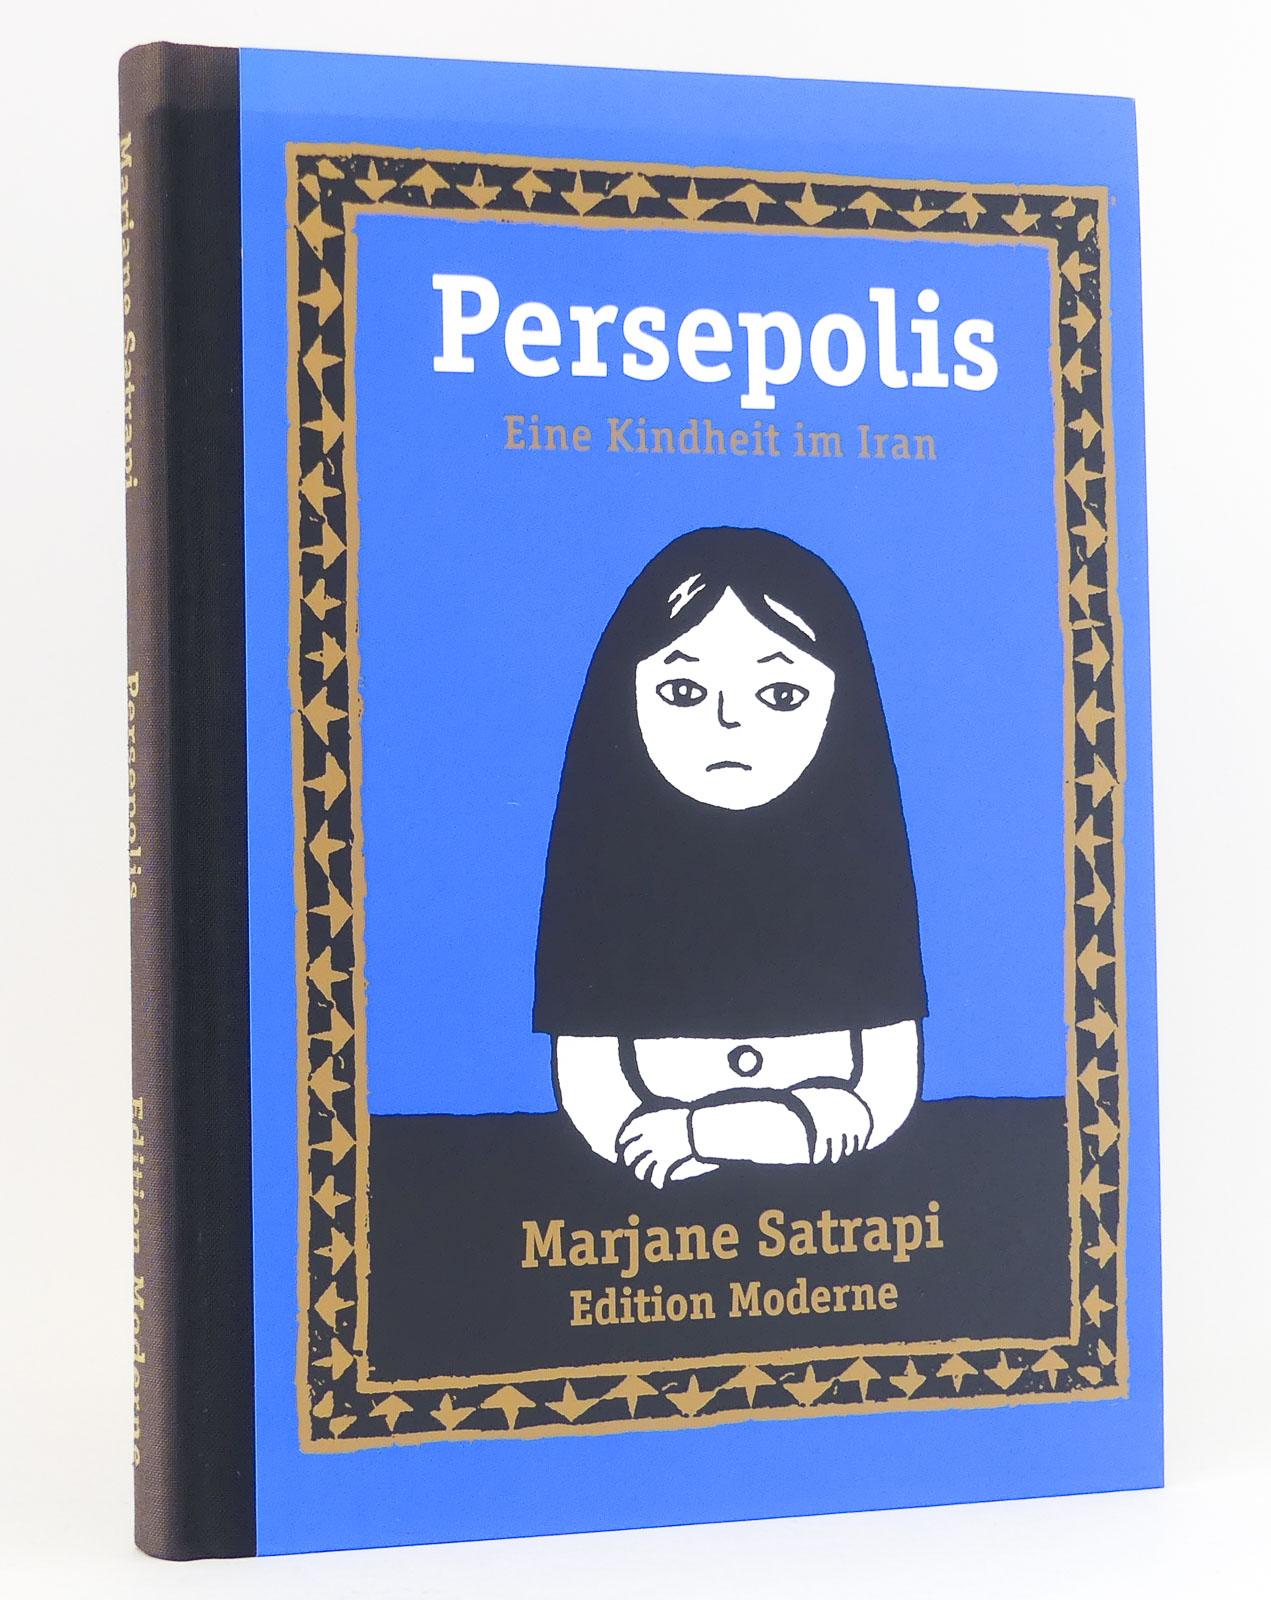 Persepolis, Band 1: Eine Kindheit im Iran - Satrapi, Marjane